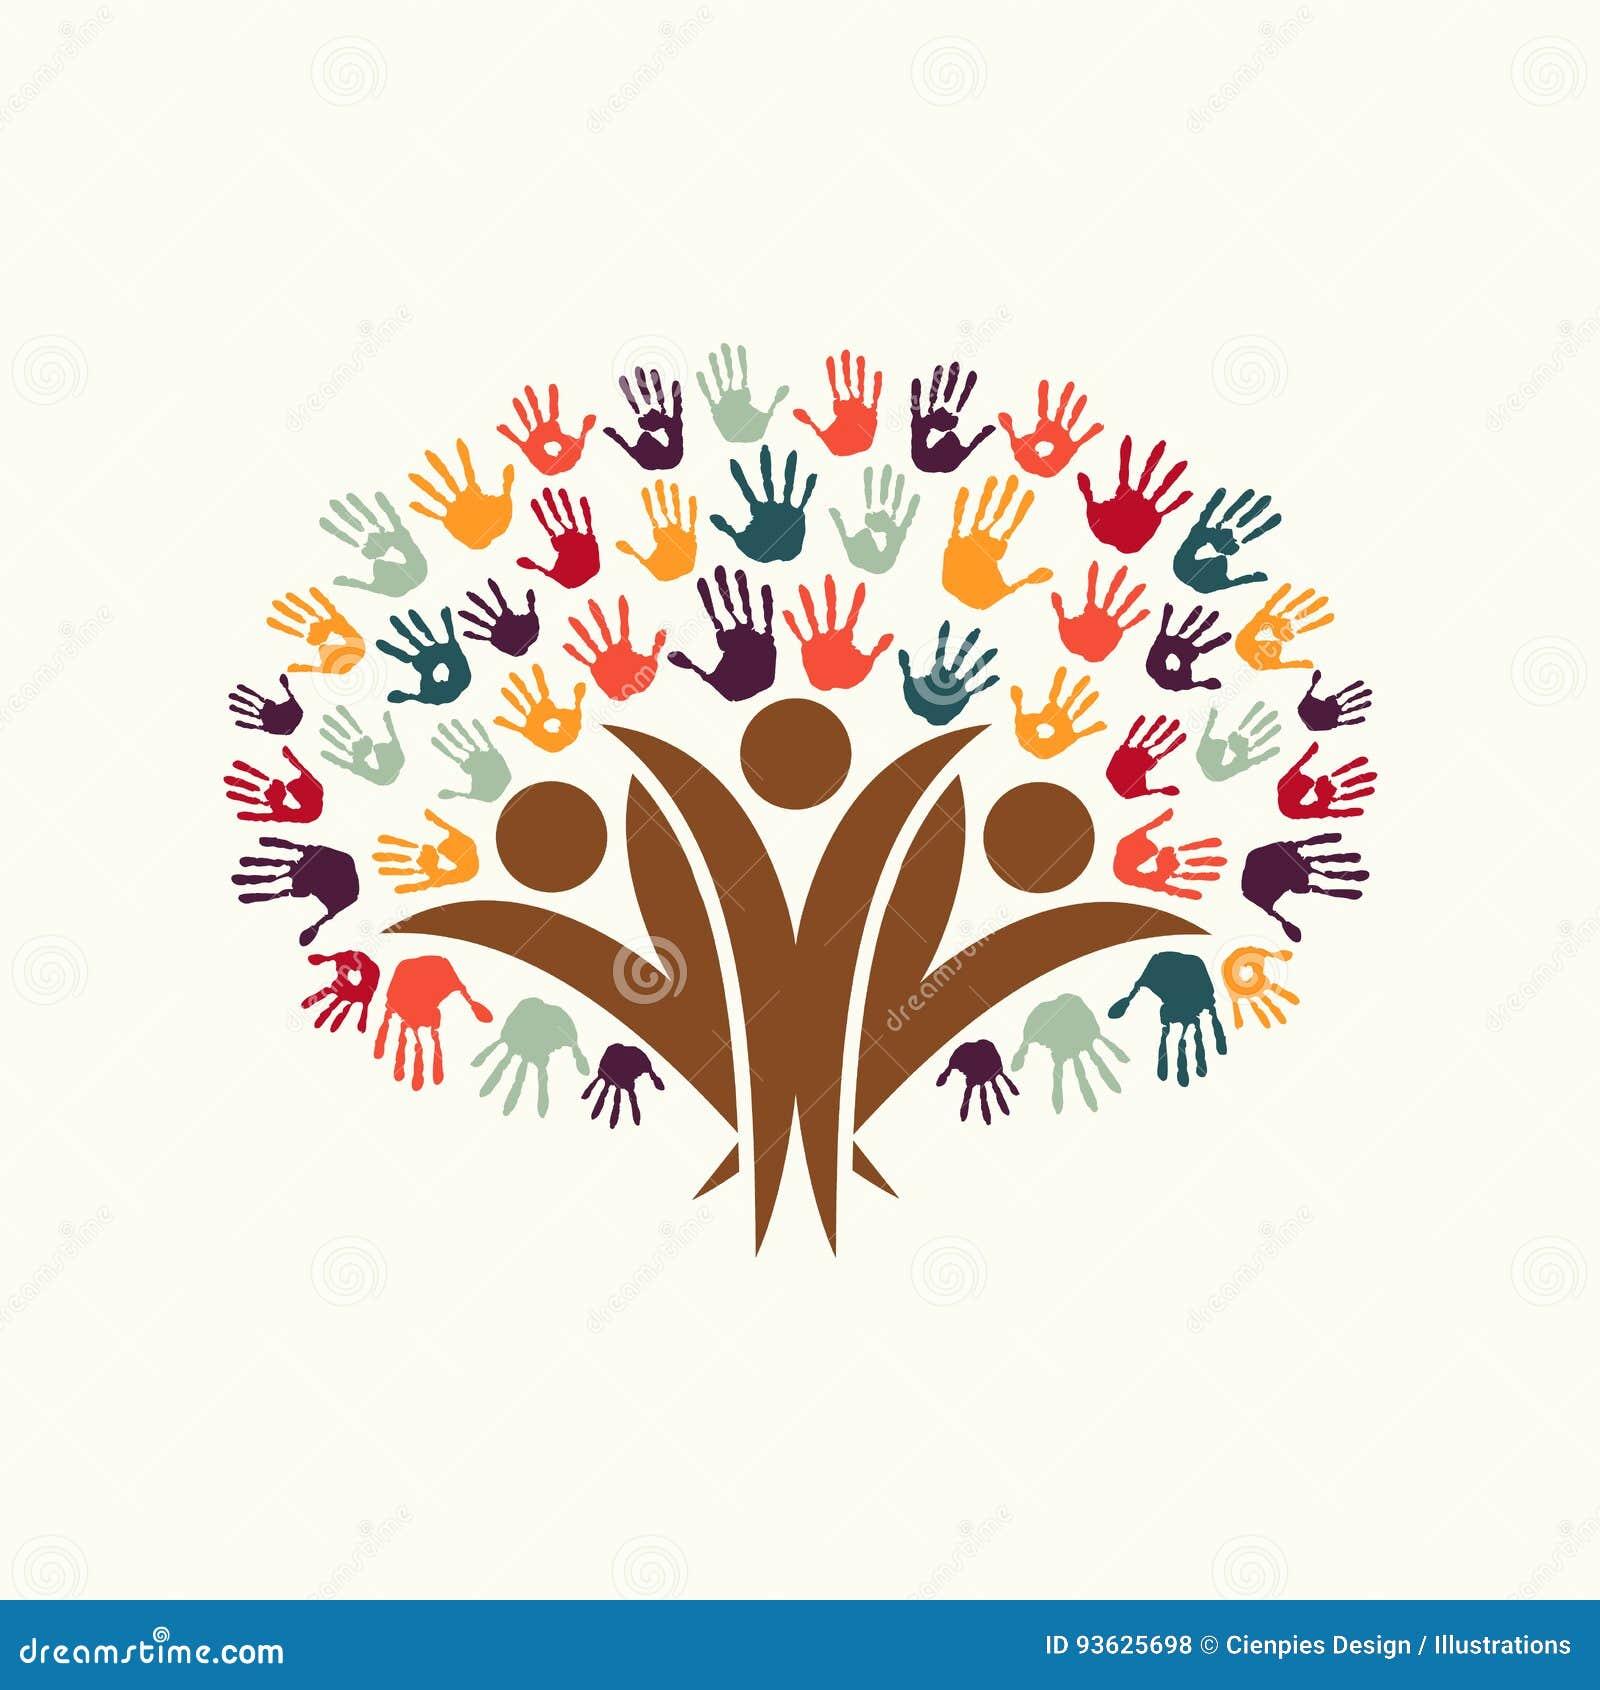 Hand Print People Tree Symbol For Community Help Stock